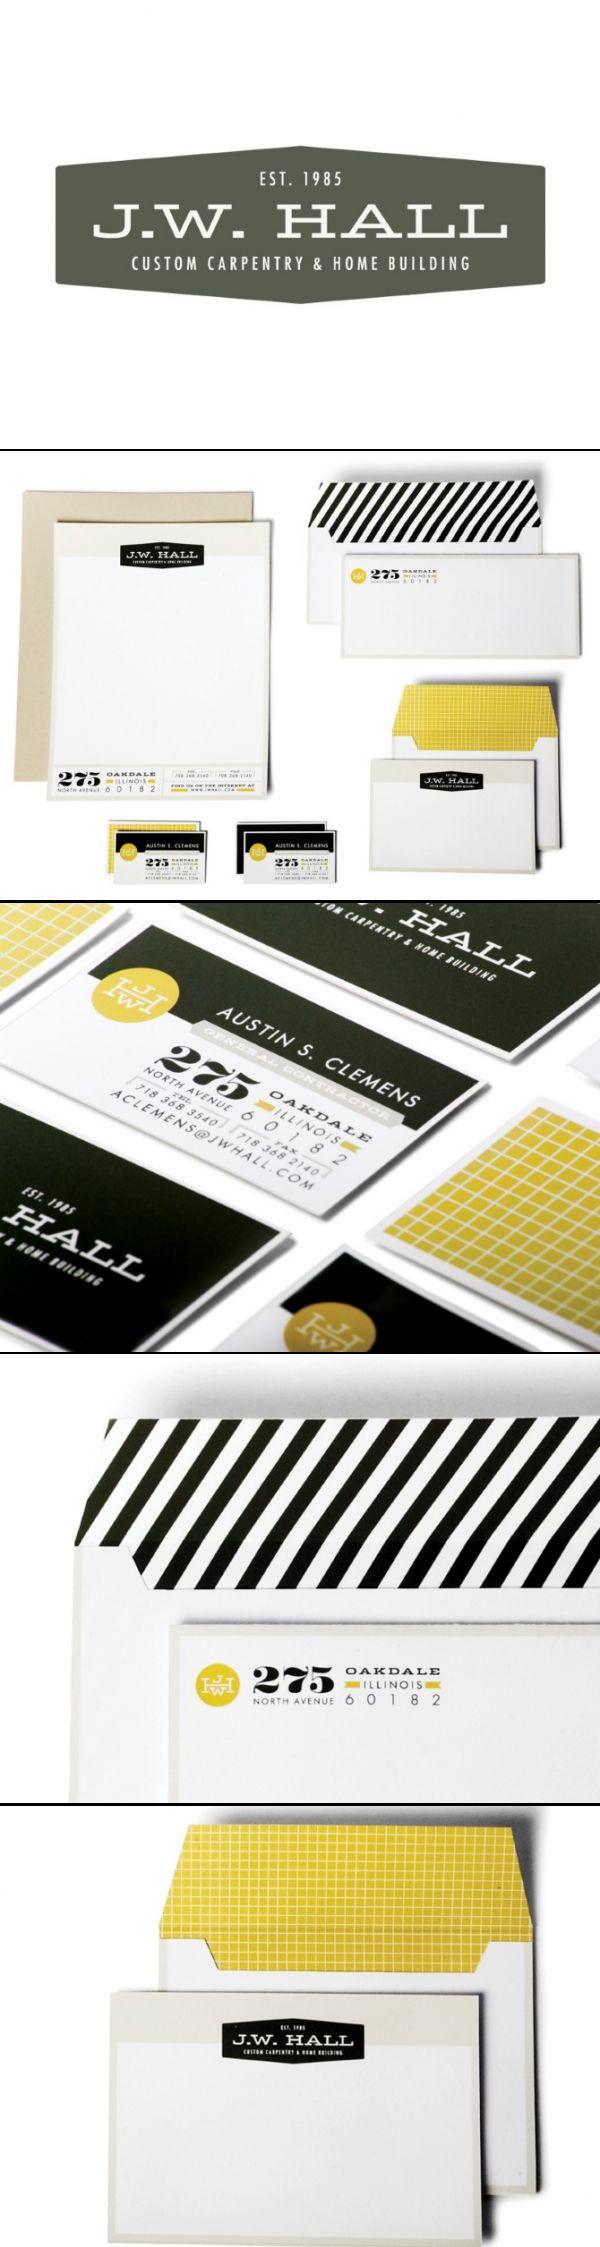 J.W. Hall Builders | Abby Brewster | #stationary #corporate #design #corporatedesign #identity #branding #marketing < repinned by www.BlickeDeeler.de | Take a look at www.LogoGestaltung-Hamburg.de